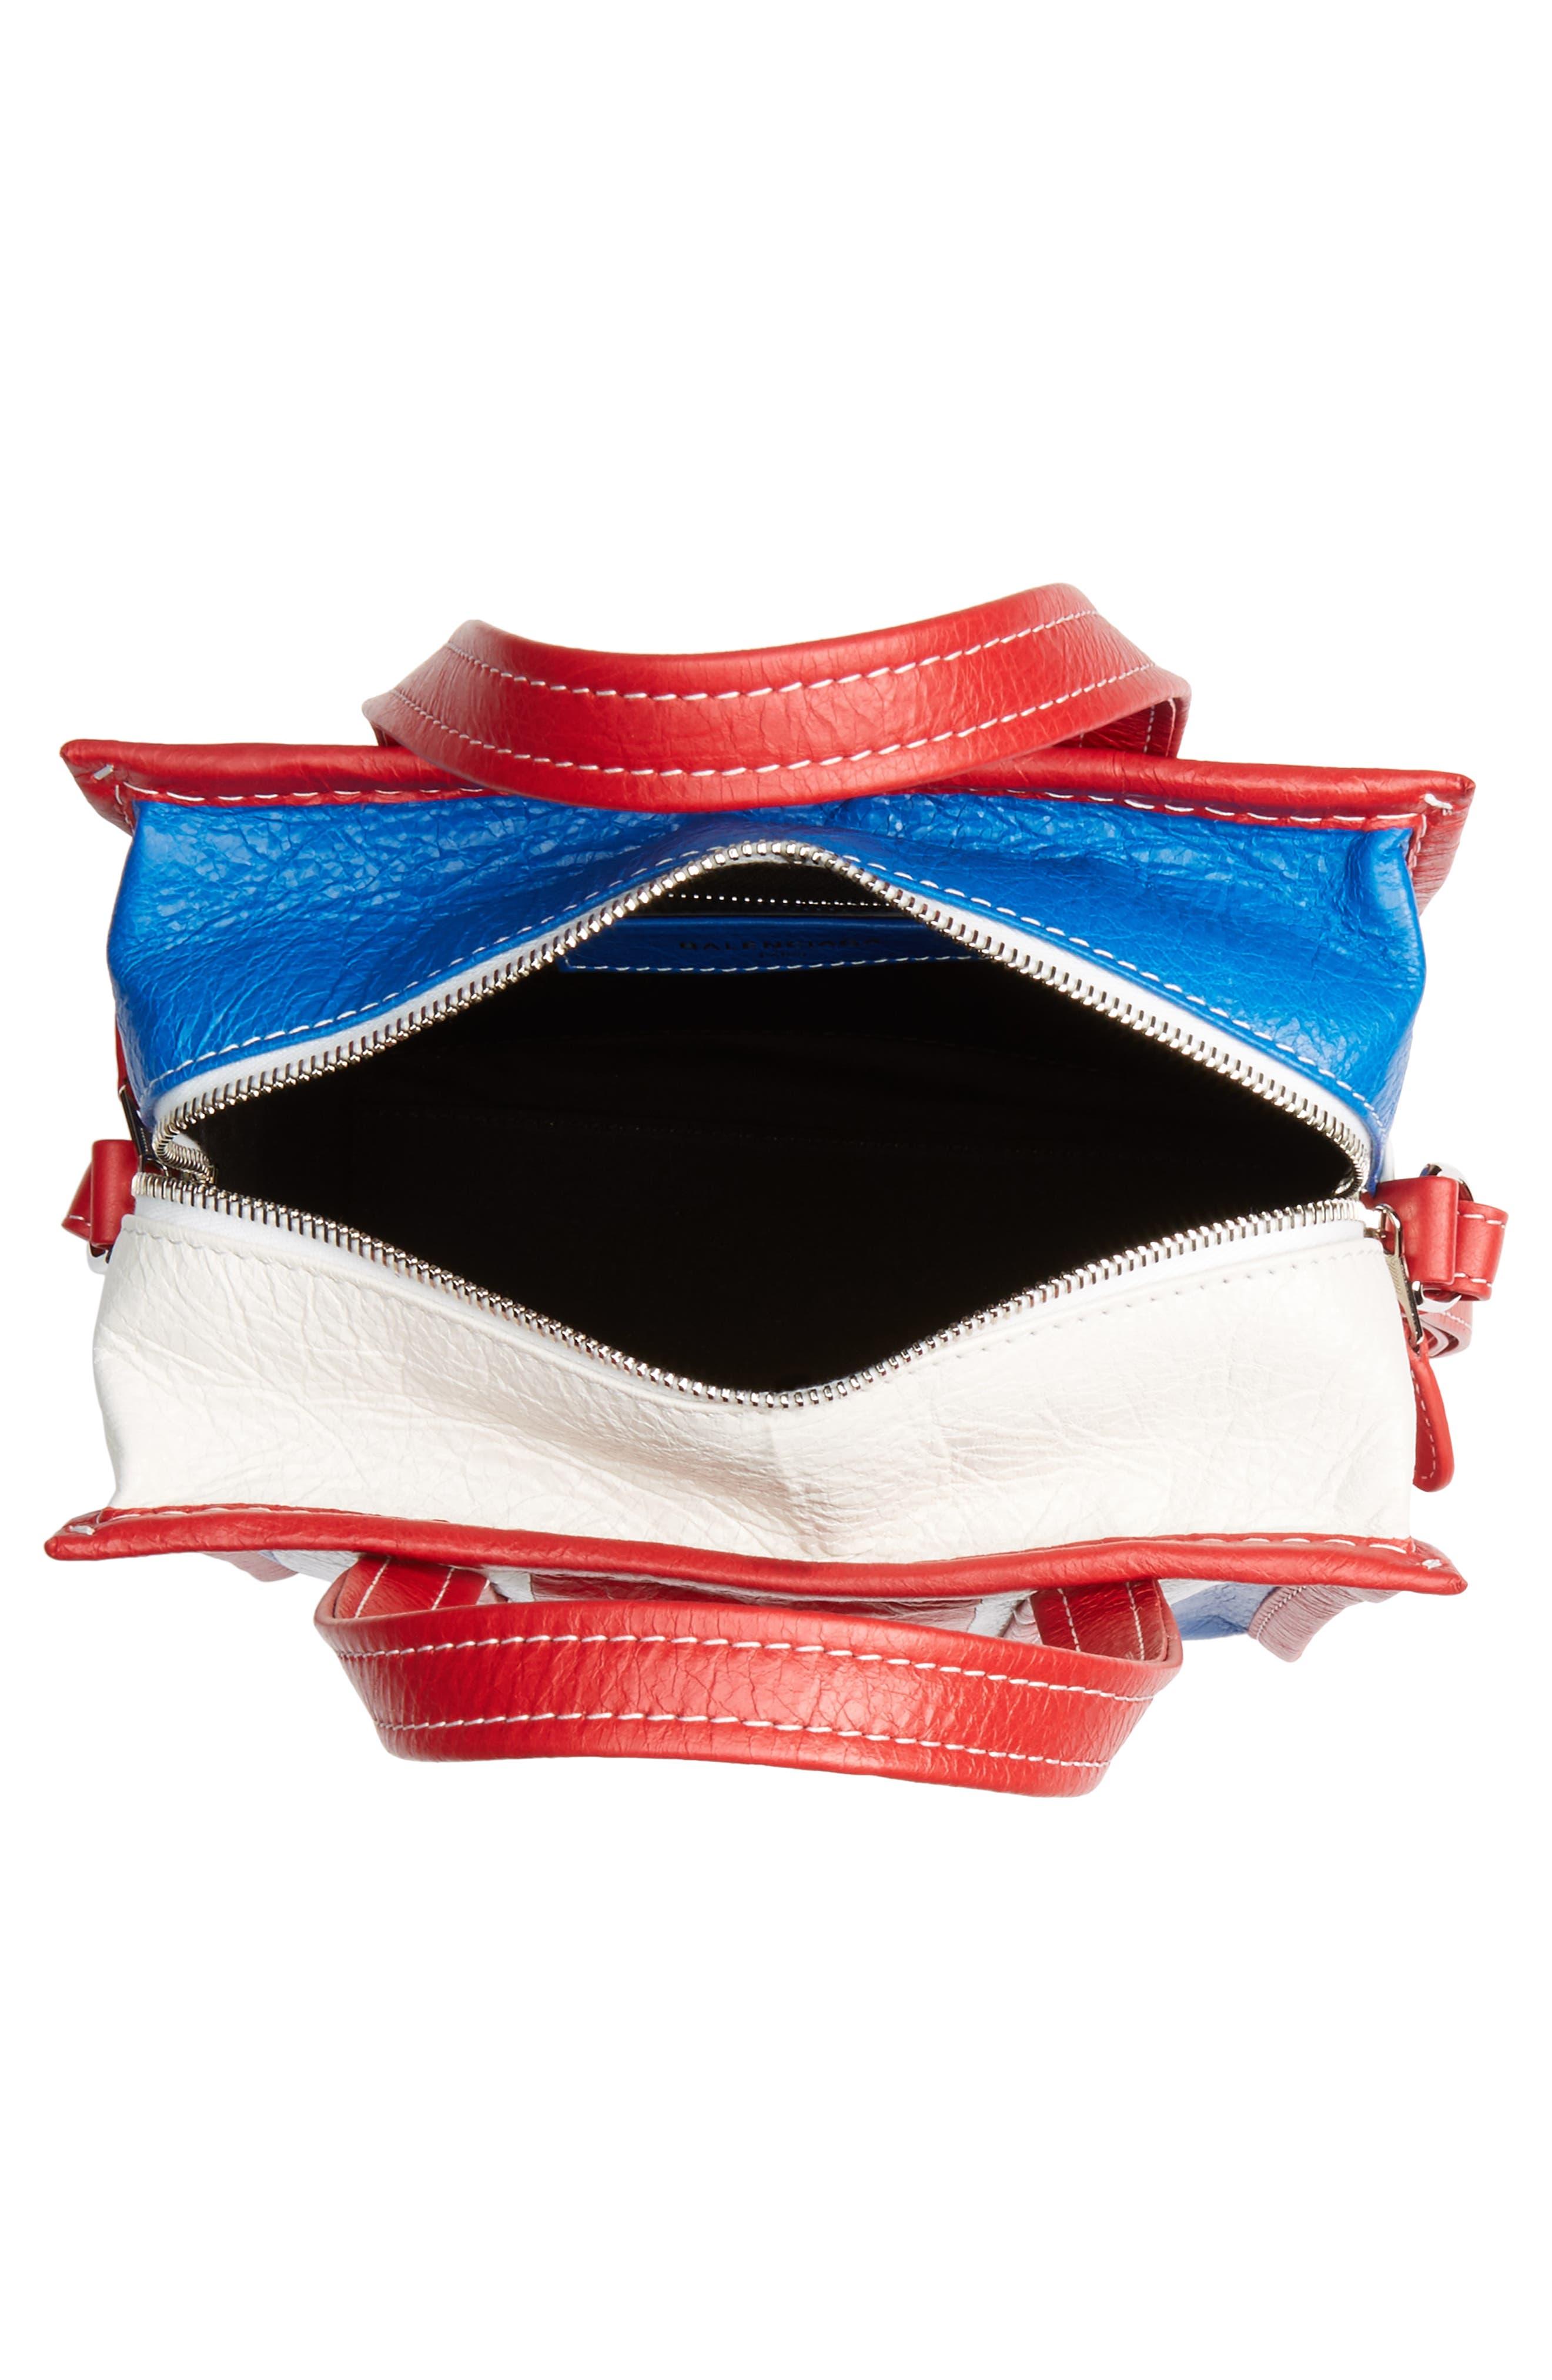 Extra Small Bazar Leather AJ Shopper,                             Alternate thumbnail 4, color,                             BLUE/ BLANC/ ROUGE